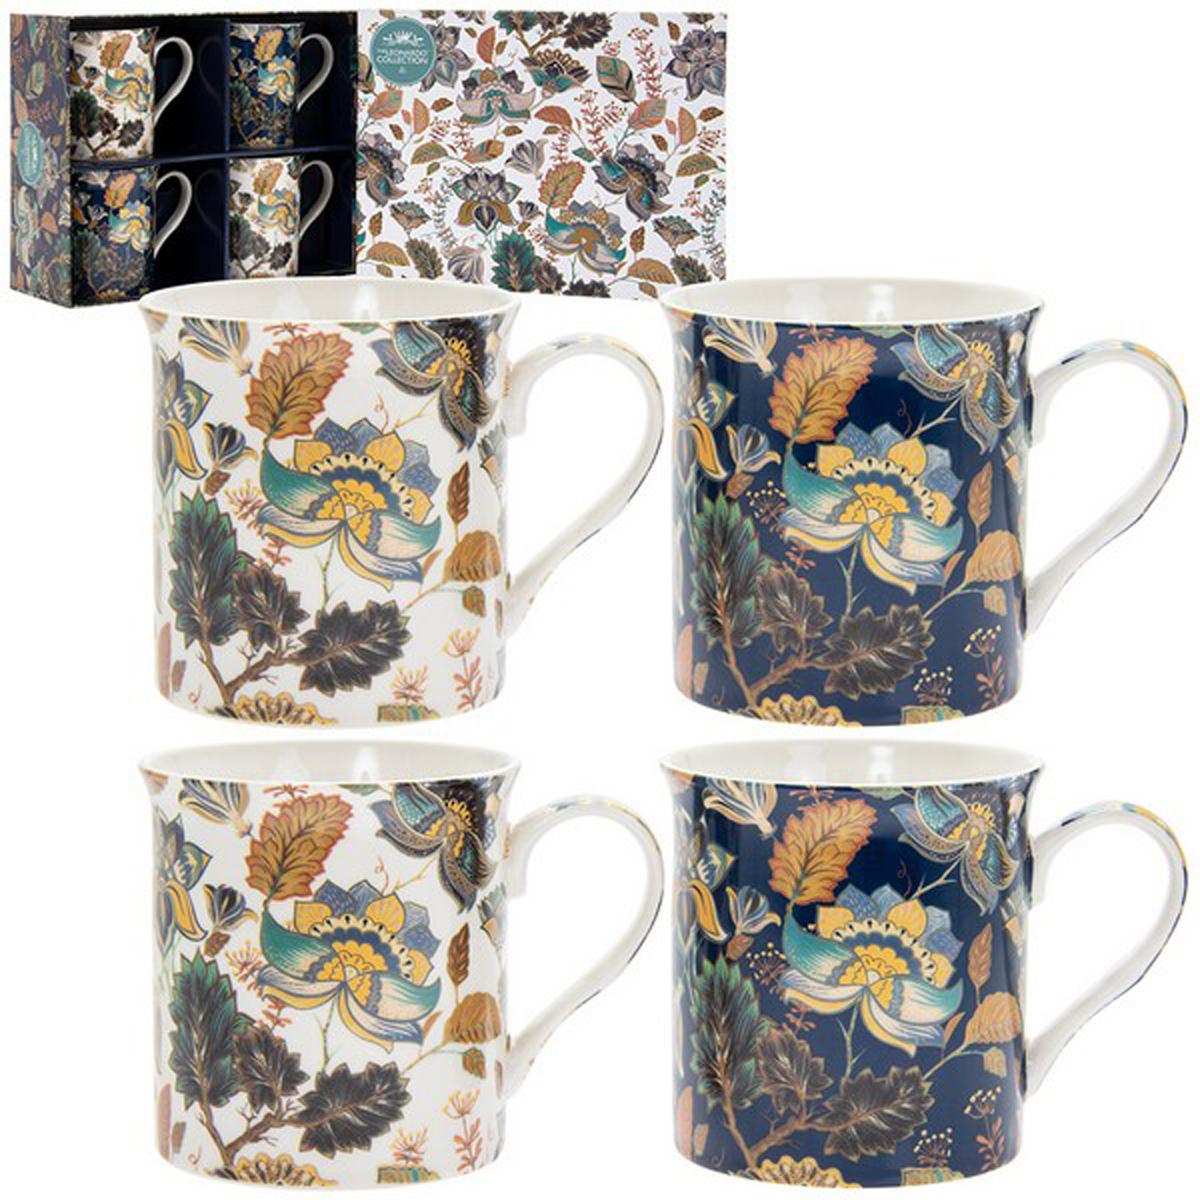 Coffret mugs porcelaine \'Aurora\' bleu blanc (4 mugs) - 85x85 mm  - [R2677]